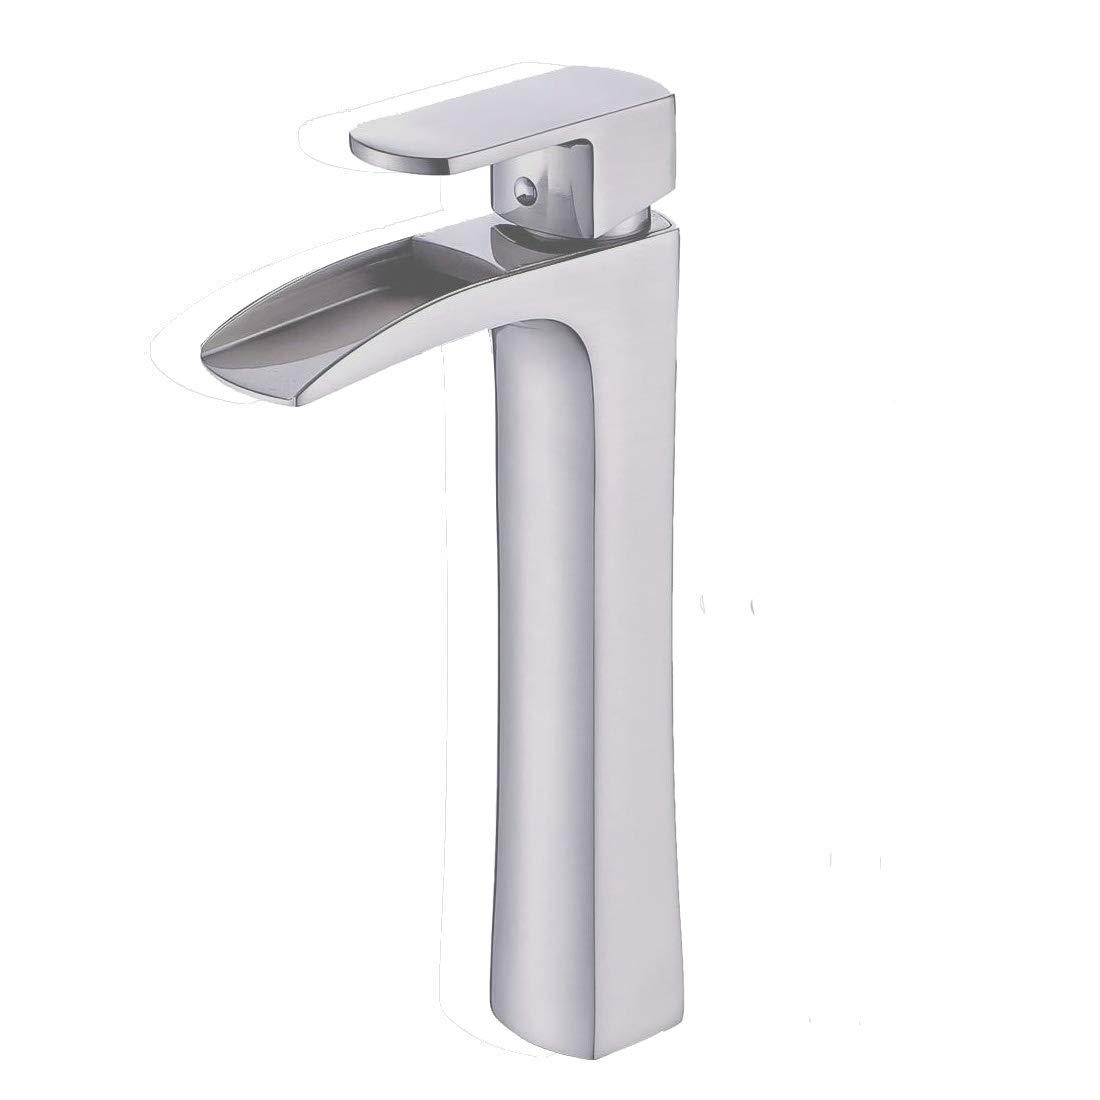 Mono Basin Mixer Tap in Bathroom, Designer Style,Solid Brass, Polish Chrome, Beelee BL8801 Bela